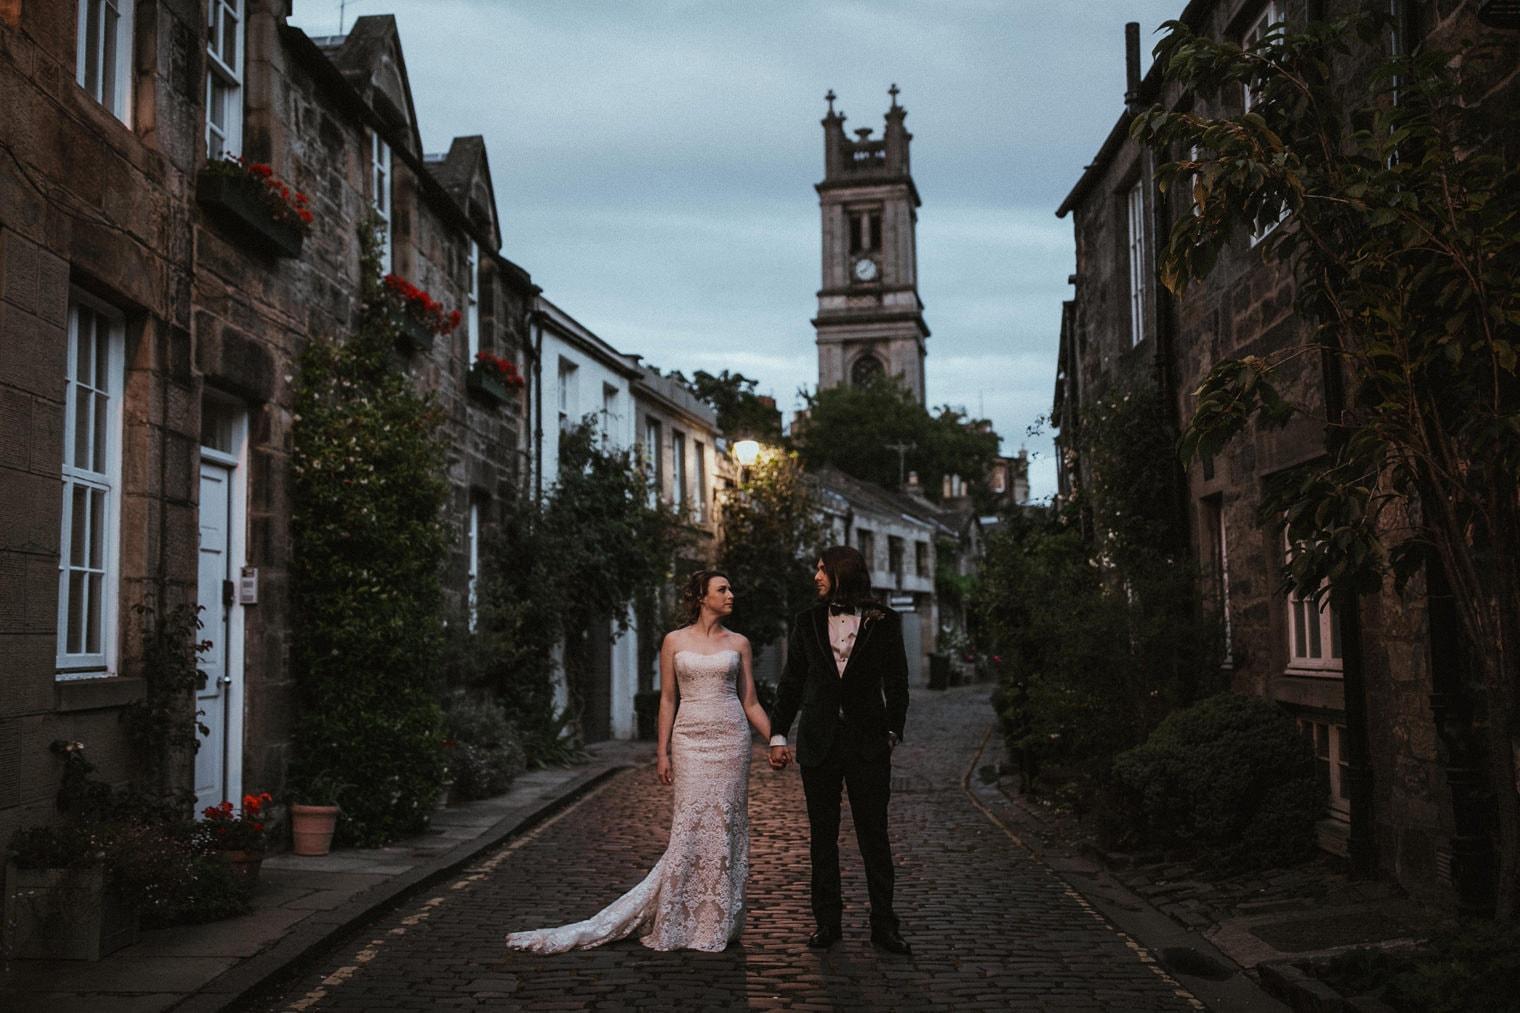 Bride and Groom in Circus Lane, Edinburgh, Scotland